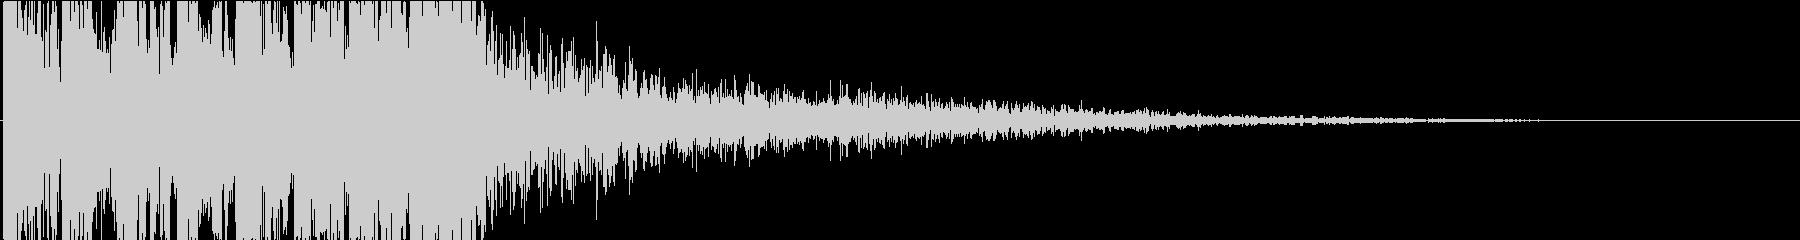 KANTシネマティックドラムキメの未再生の波形